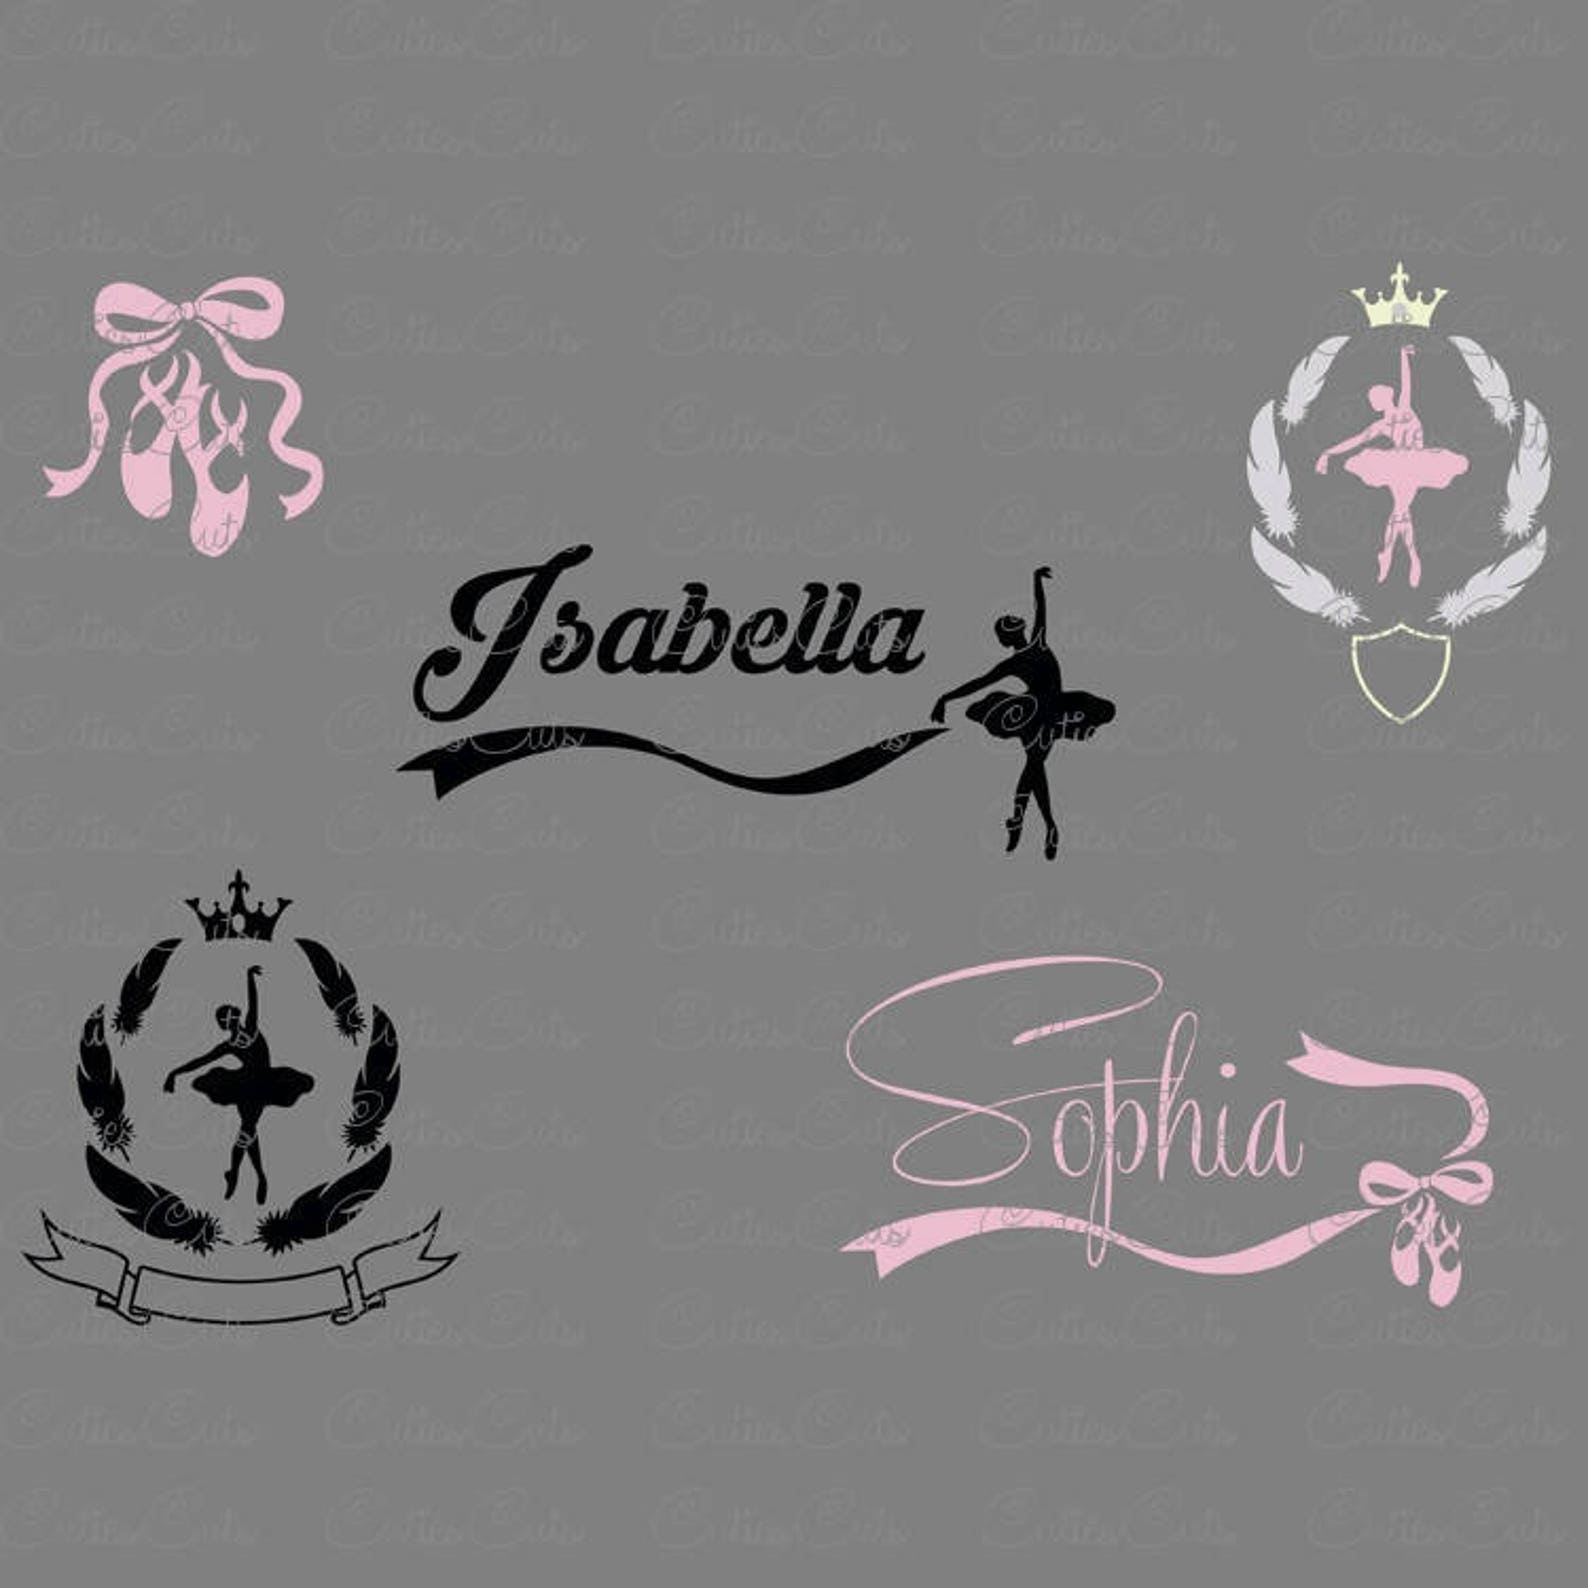 ballet svg ballerina silhouette dxf png eps files vector ballet shoes monogram dancer clipart dancing ballerina logo design prin